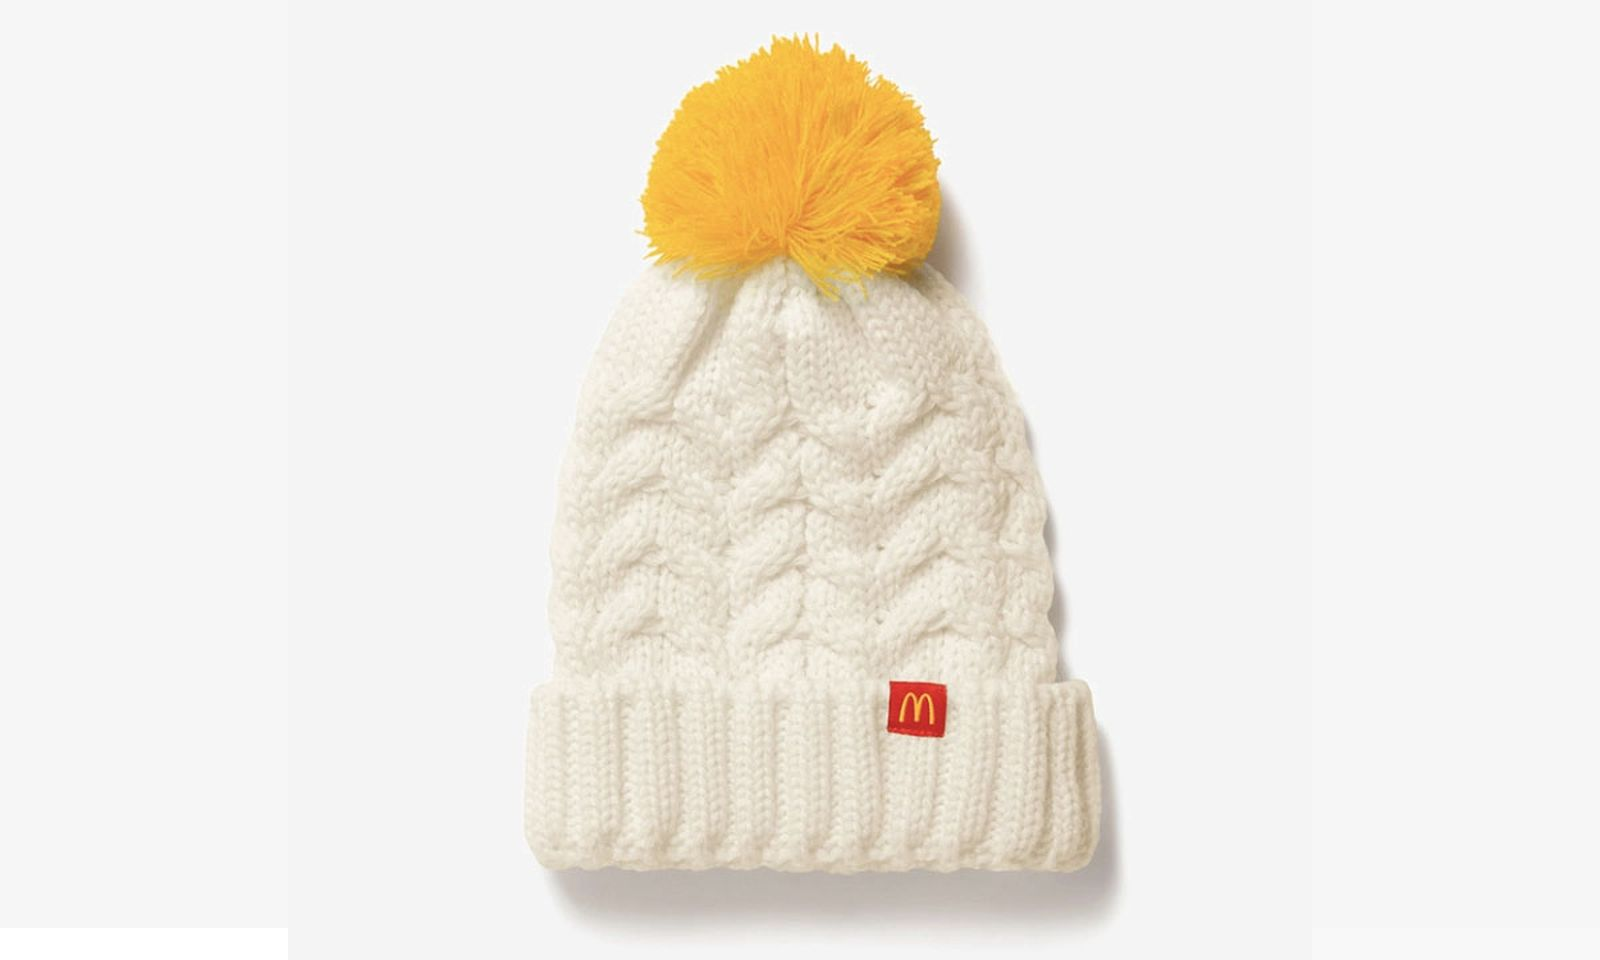 mcdonalds-hat-01